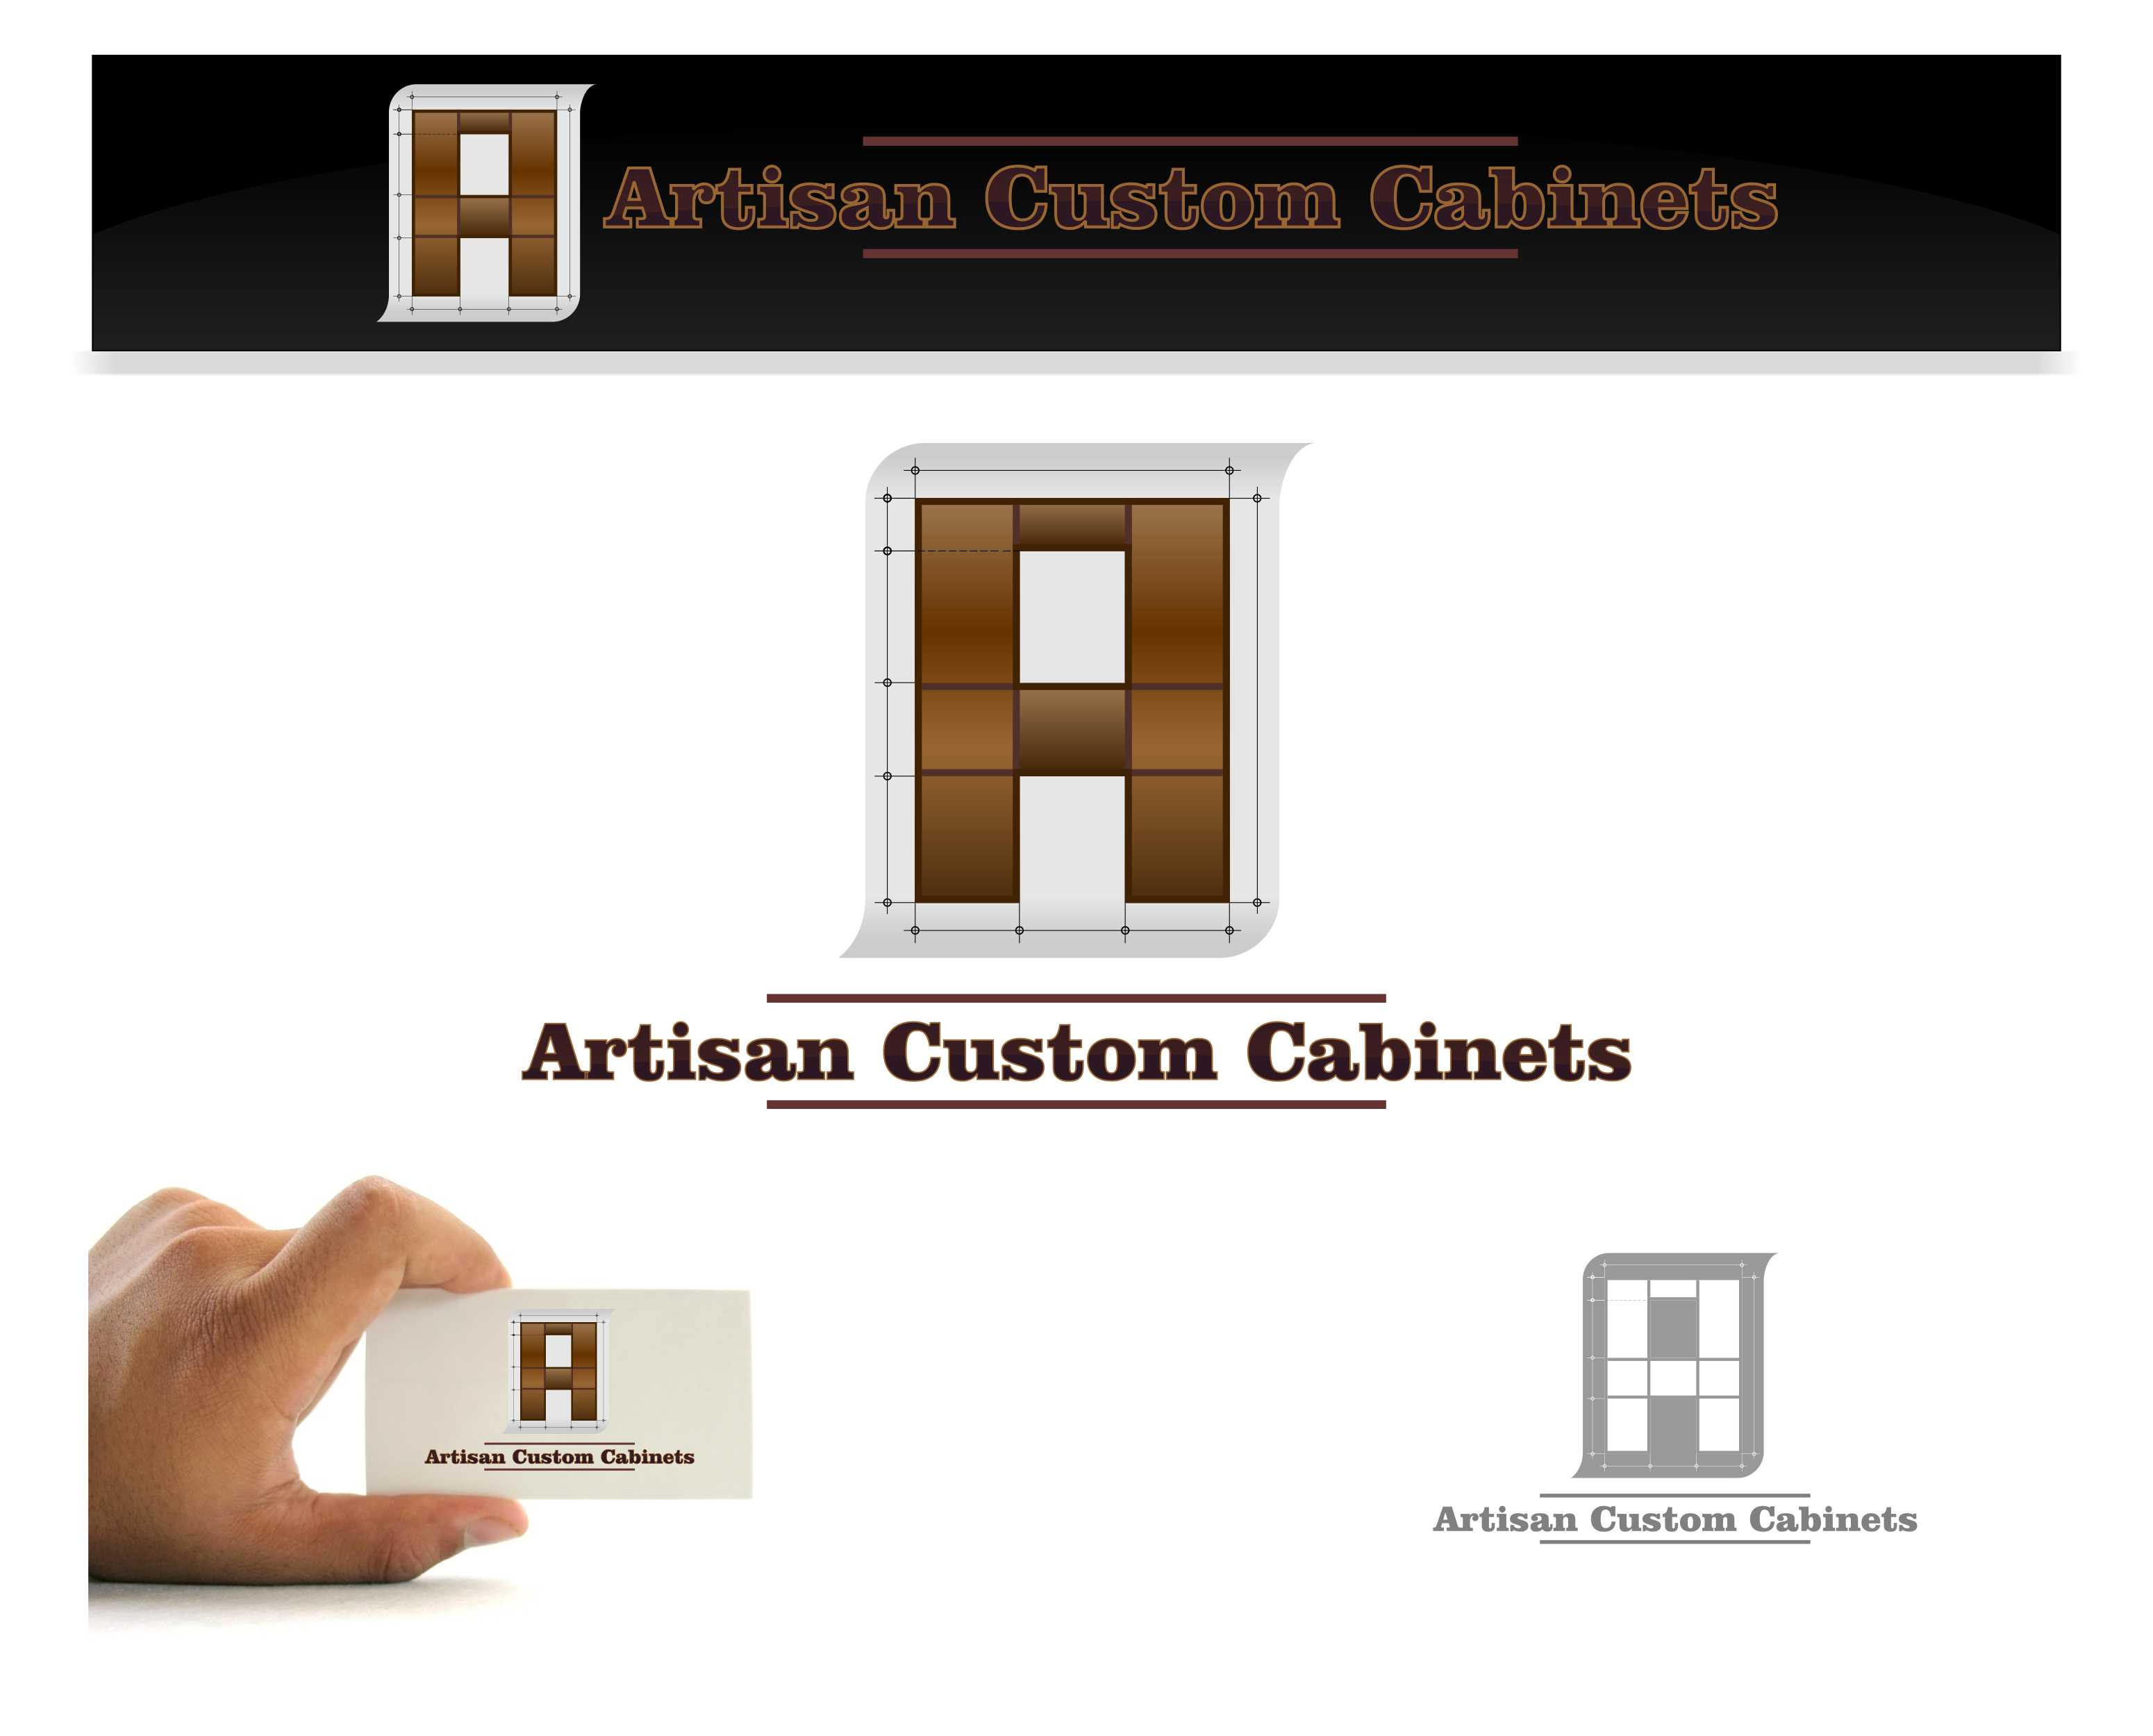 Logo Design by joca - Entry No. 31 in the Logo Design Contest Creative Logo Design for Artisan Custom Cabinets.